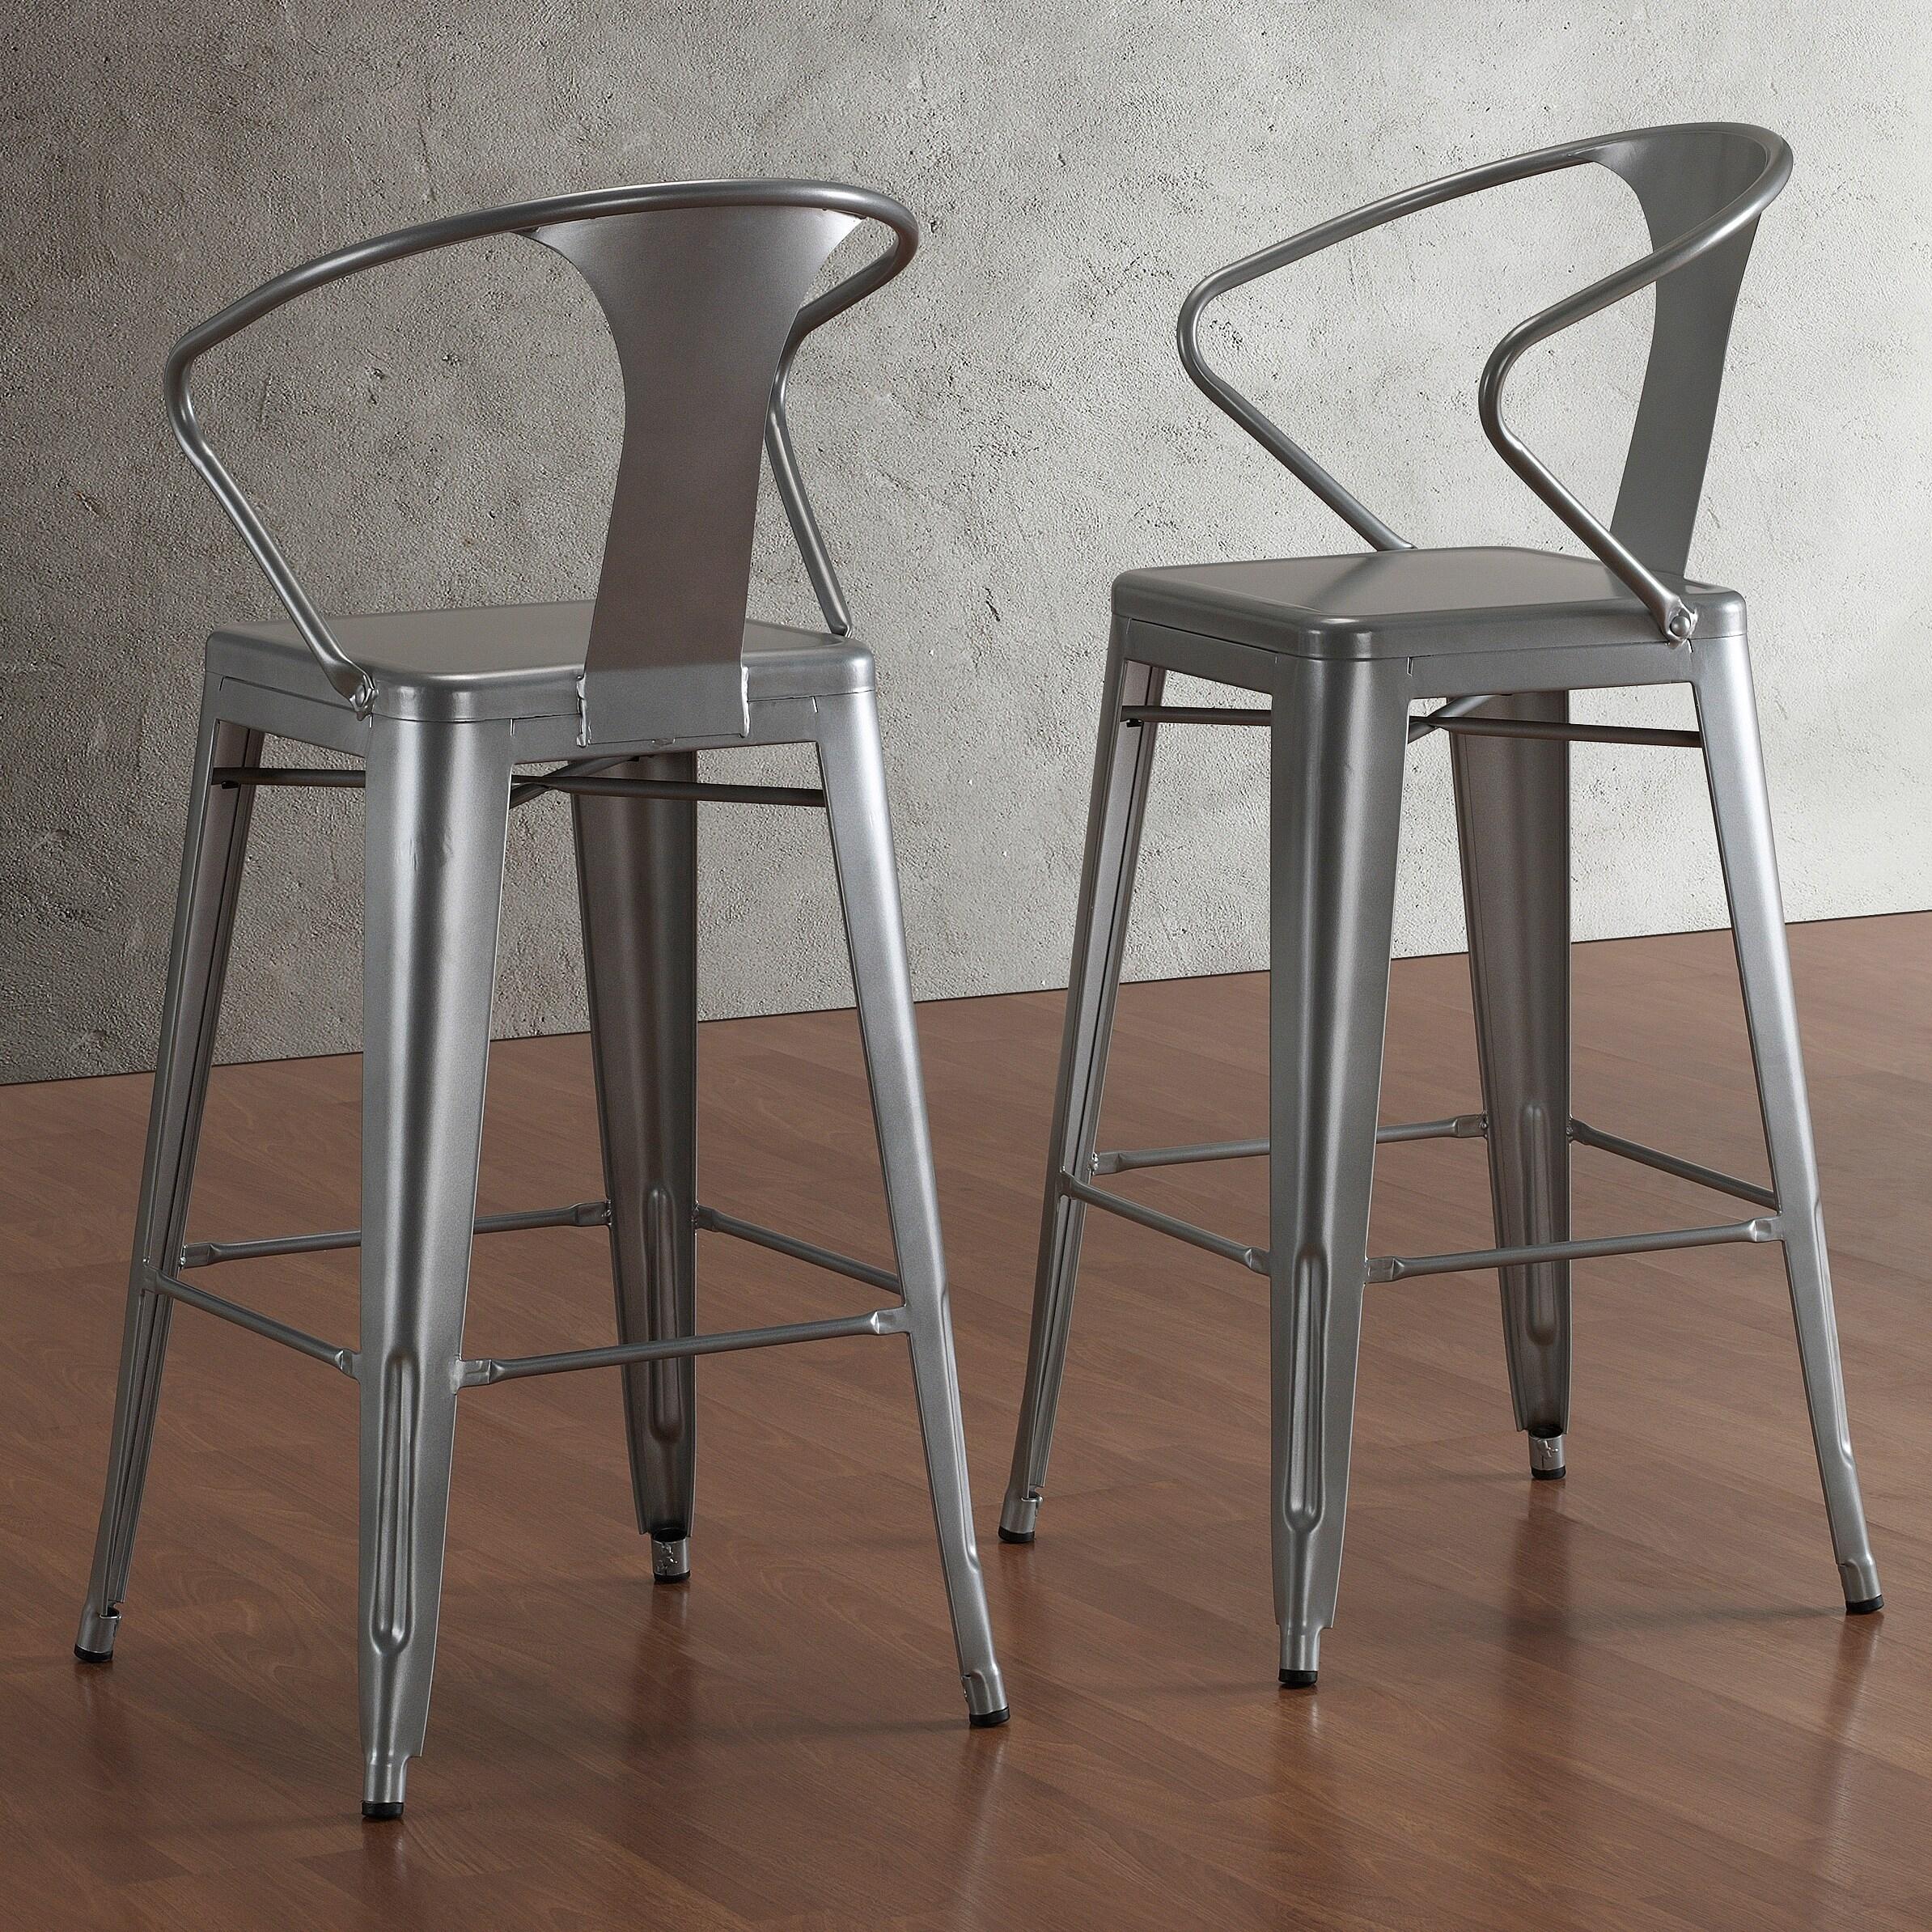 tall outdoor bar stools ideas on foter